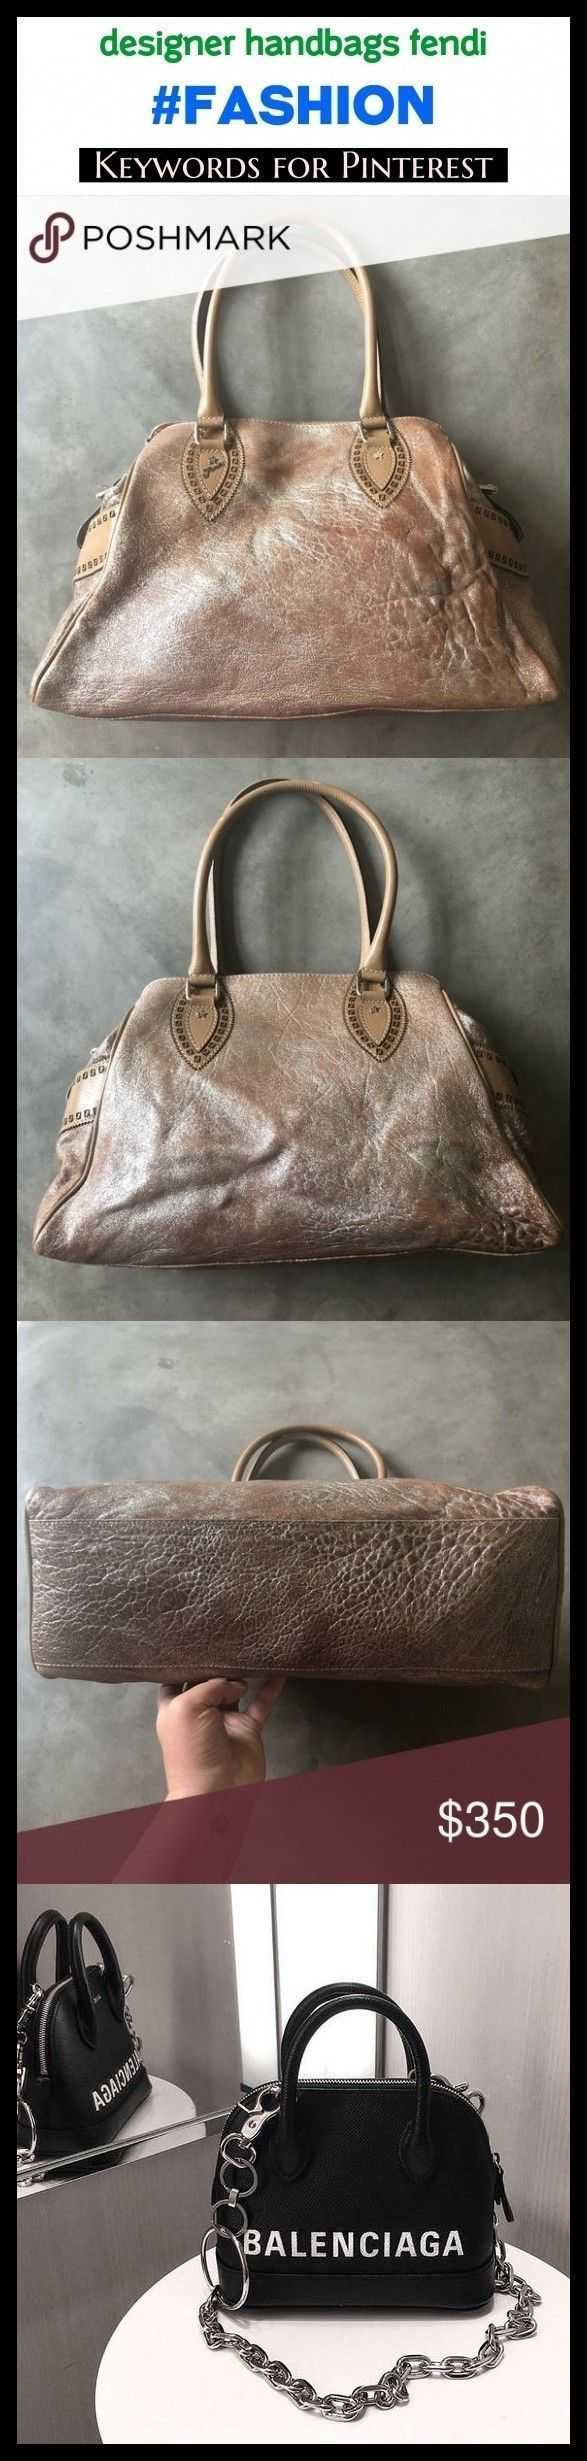 Celebrity style  #Designer #handbags #birkin Designer handbags birkin, Designer ...#birkin #celebrity #designer #handbags #style